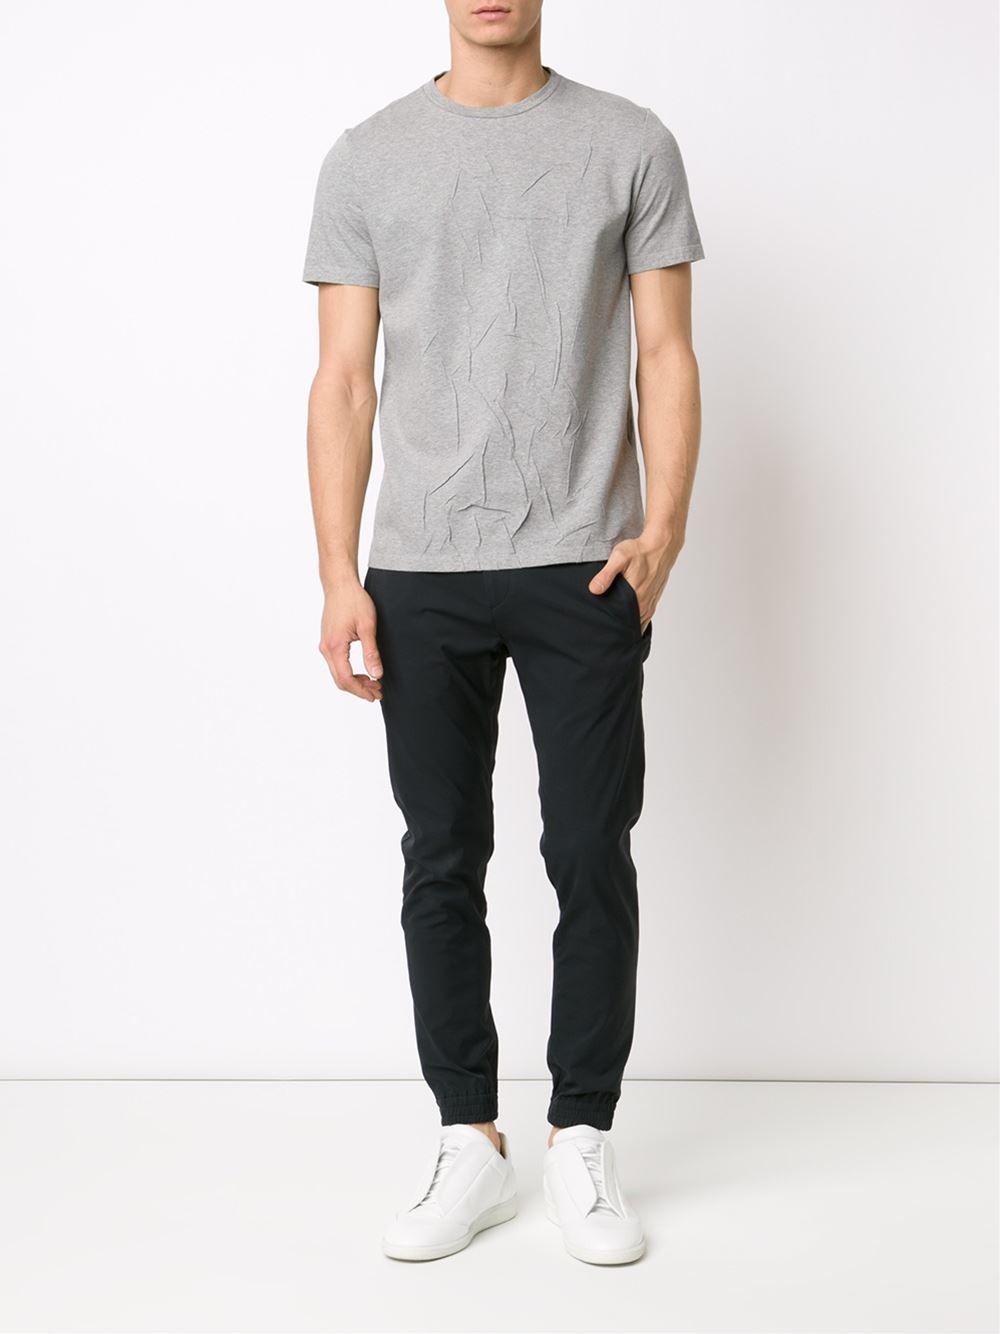 MAISON MARGIELA /// メゾンマルジェラ Wrinkled T-shirts しわ加工Tシャツ (Grey)